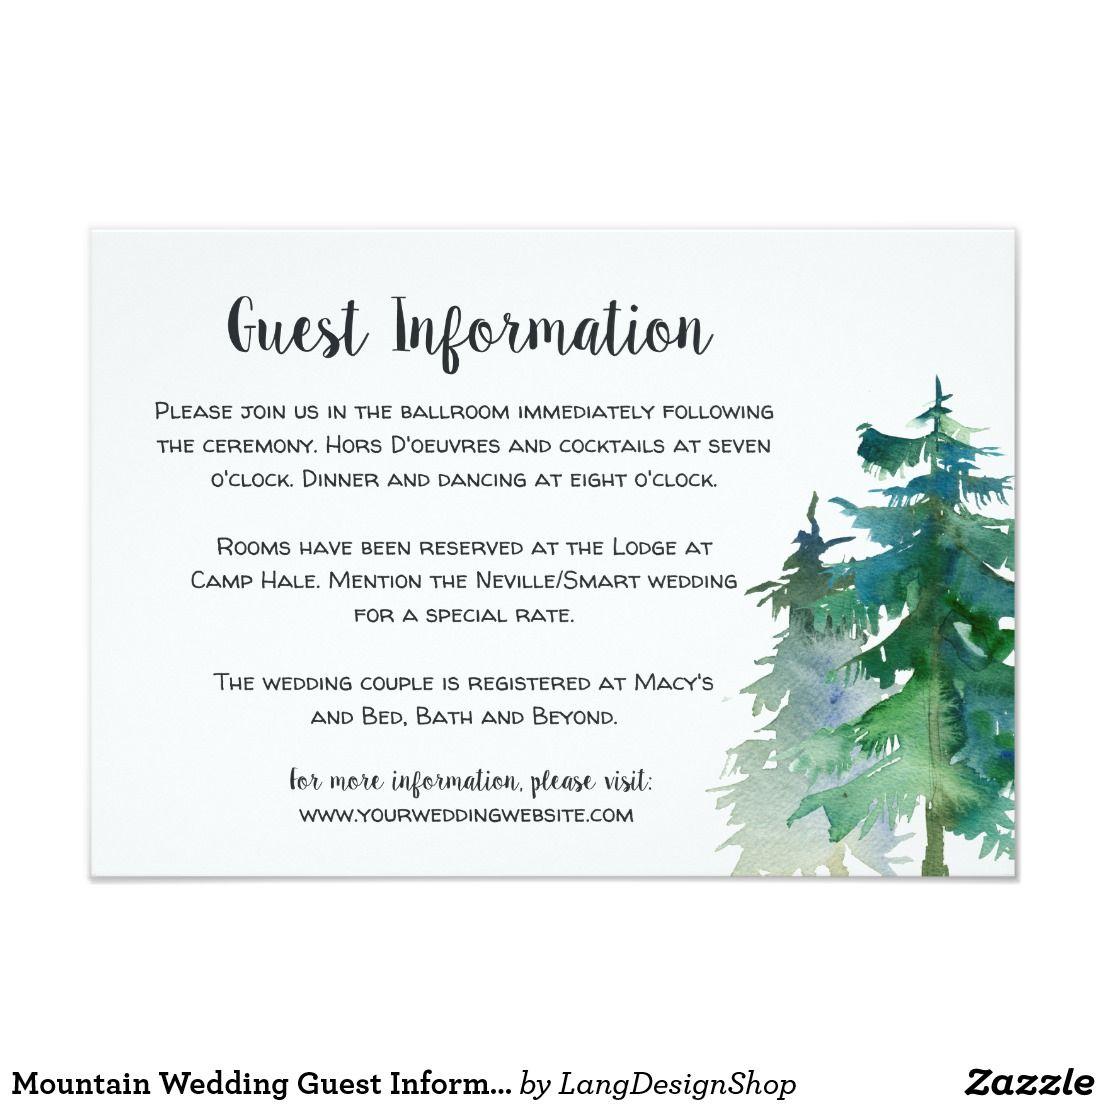 Wedding Venues Near Me Cheap: Mountain Wedding Guest Information Card